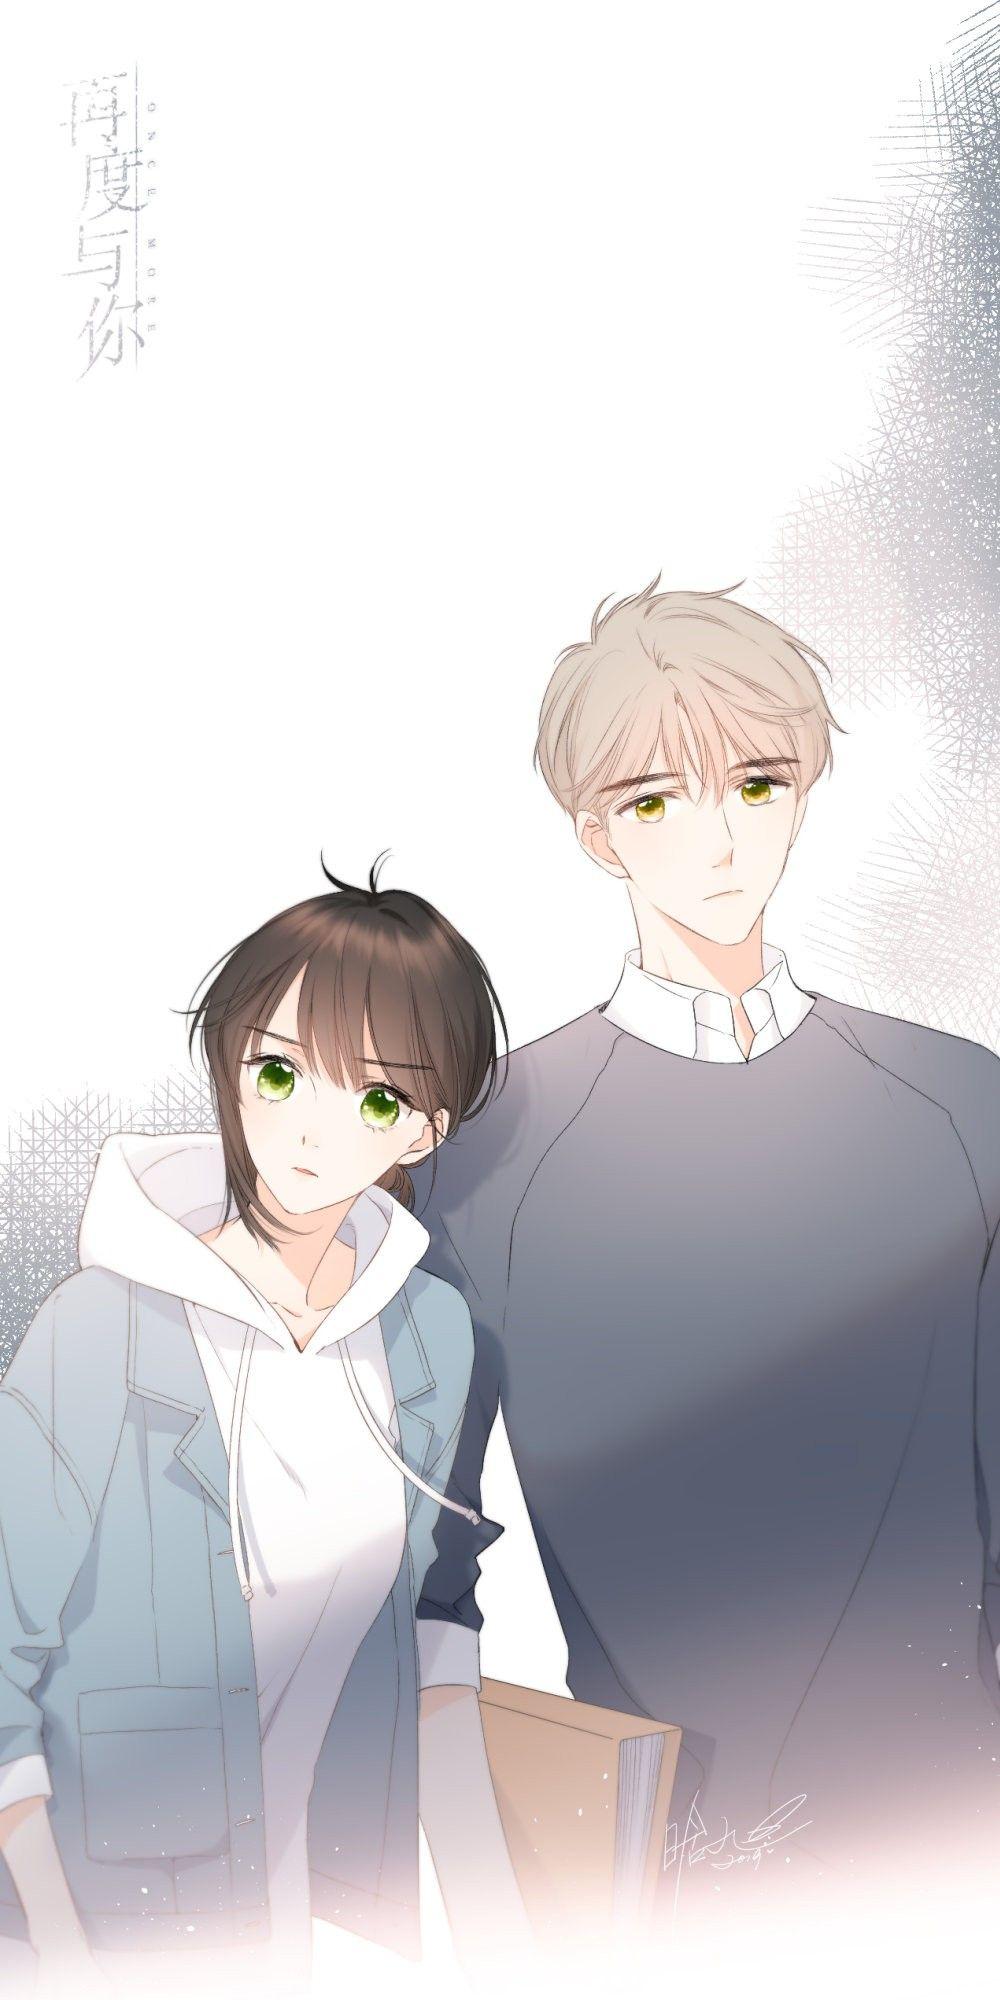 Ghim của AkaneSakura trên Sakura's love / LMo Anime